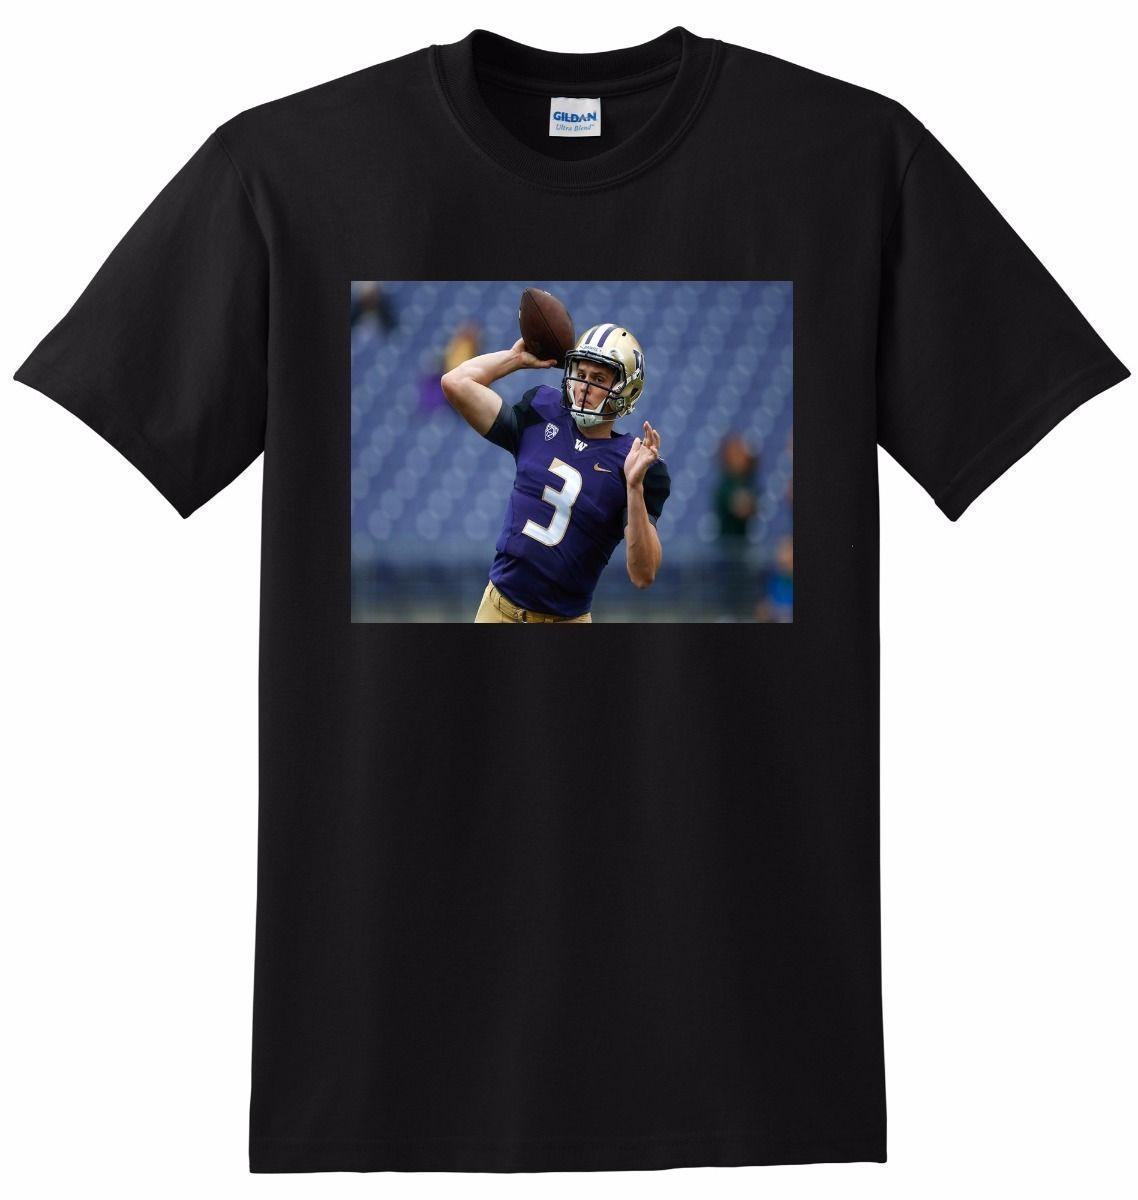 7af3dbcbb JAKE BROWNING T SHIRT Washington Football SMALL MEDIUM LARGE Or XL Neck T  Shirts T Shirts Only From Amesion102